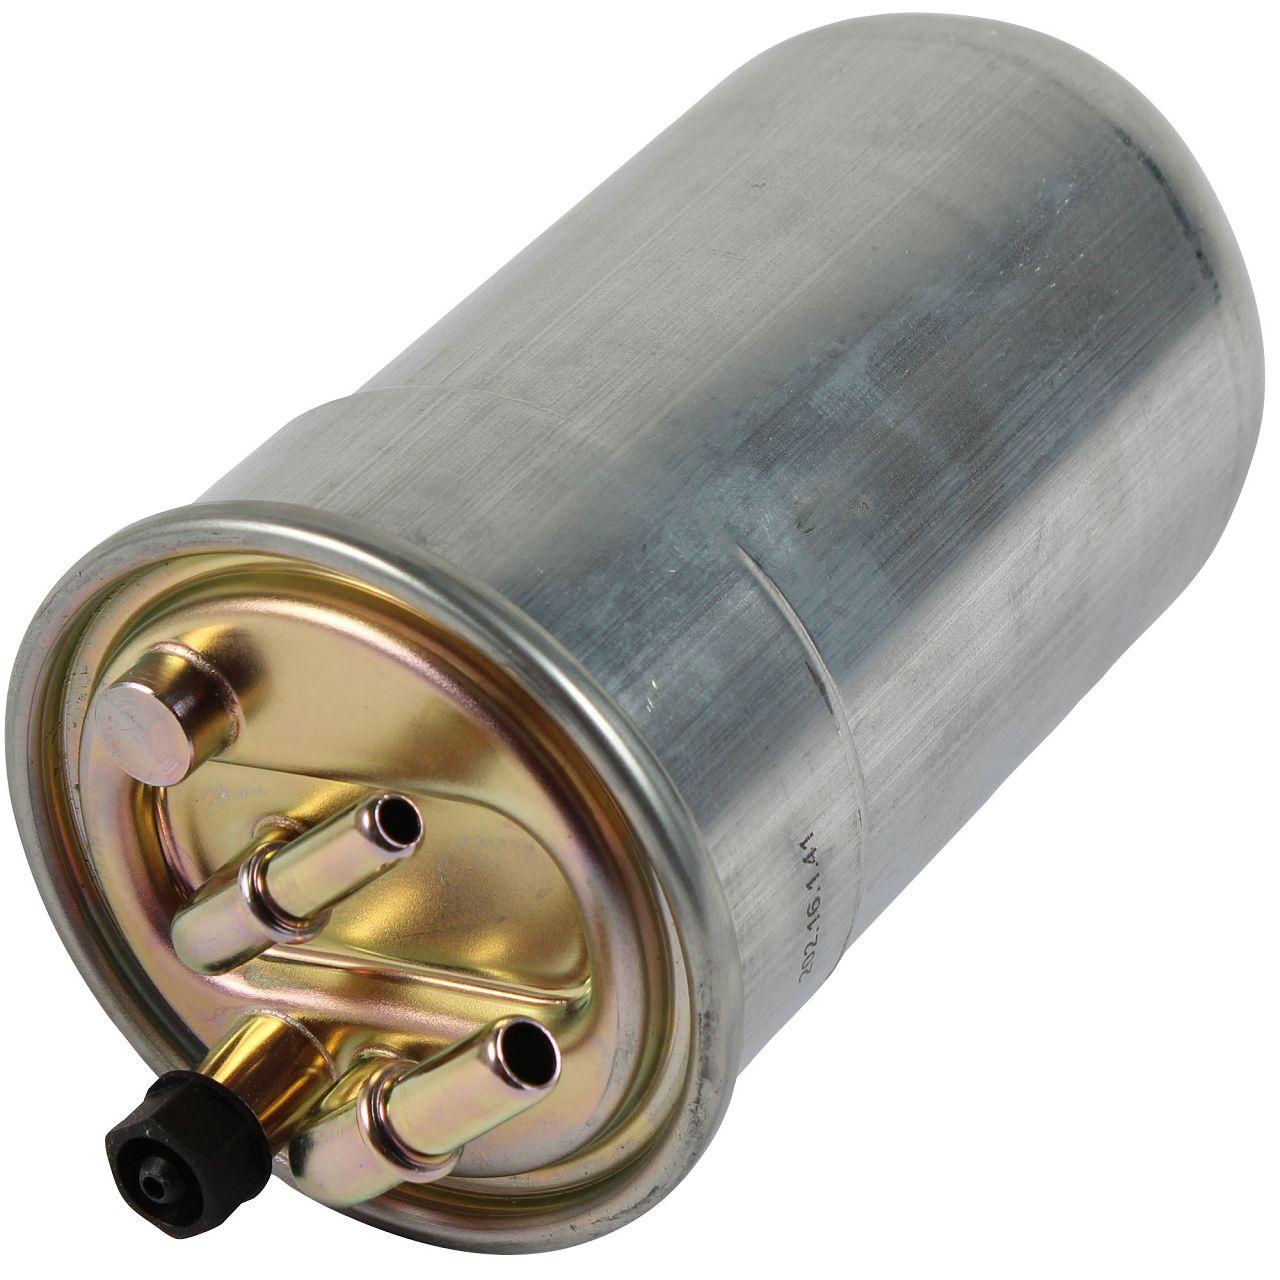 Inspektionskit Filterpaket OPEL Corsa E 1.3 CDTI 75 / 95 PS ab 09.2014